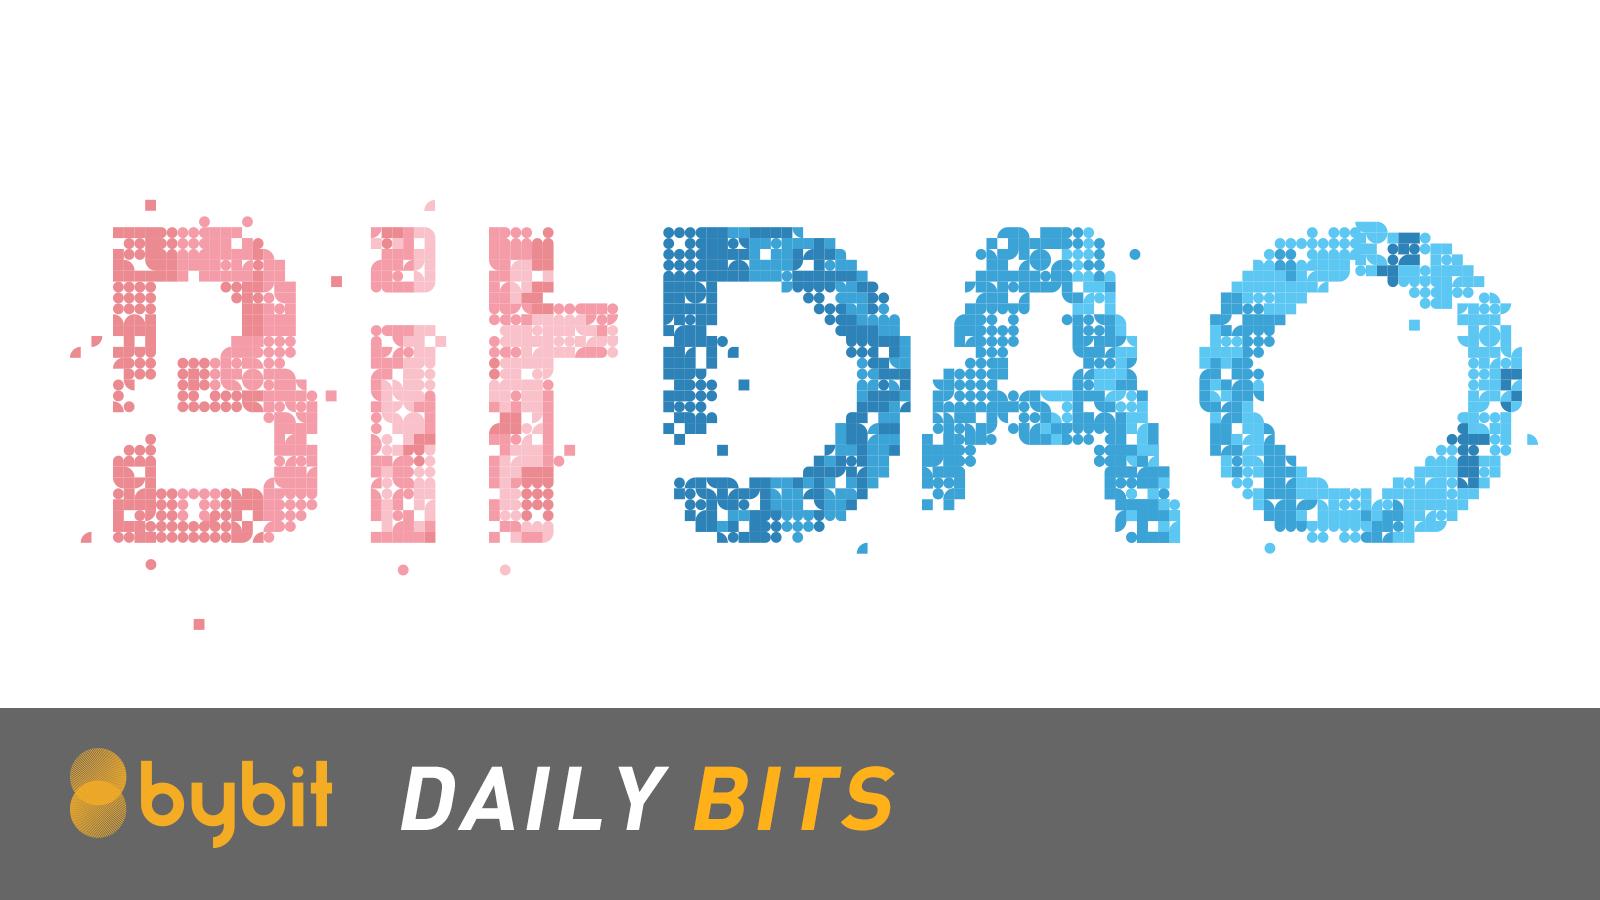 Daily Bits - BItDAO